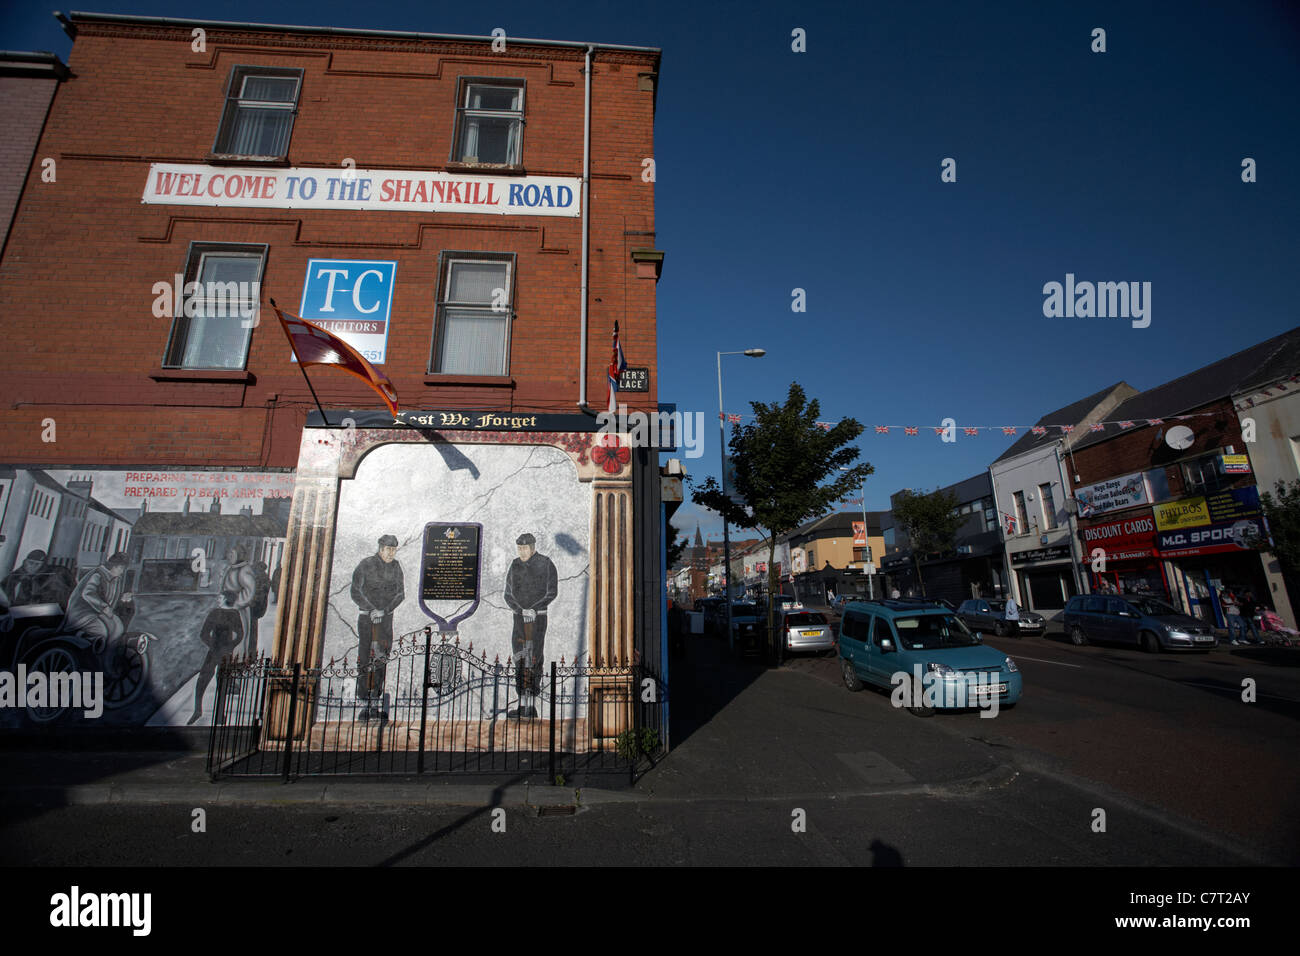 wall mural on the Shankill road, Belfast, Northern Ireland, UK. Stock Photo